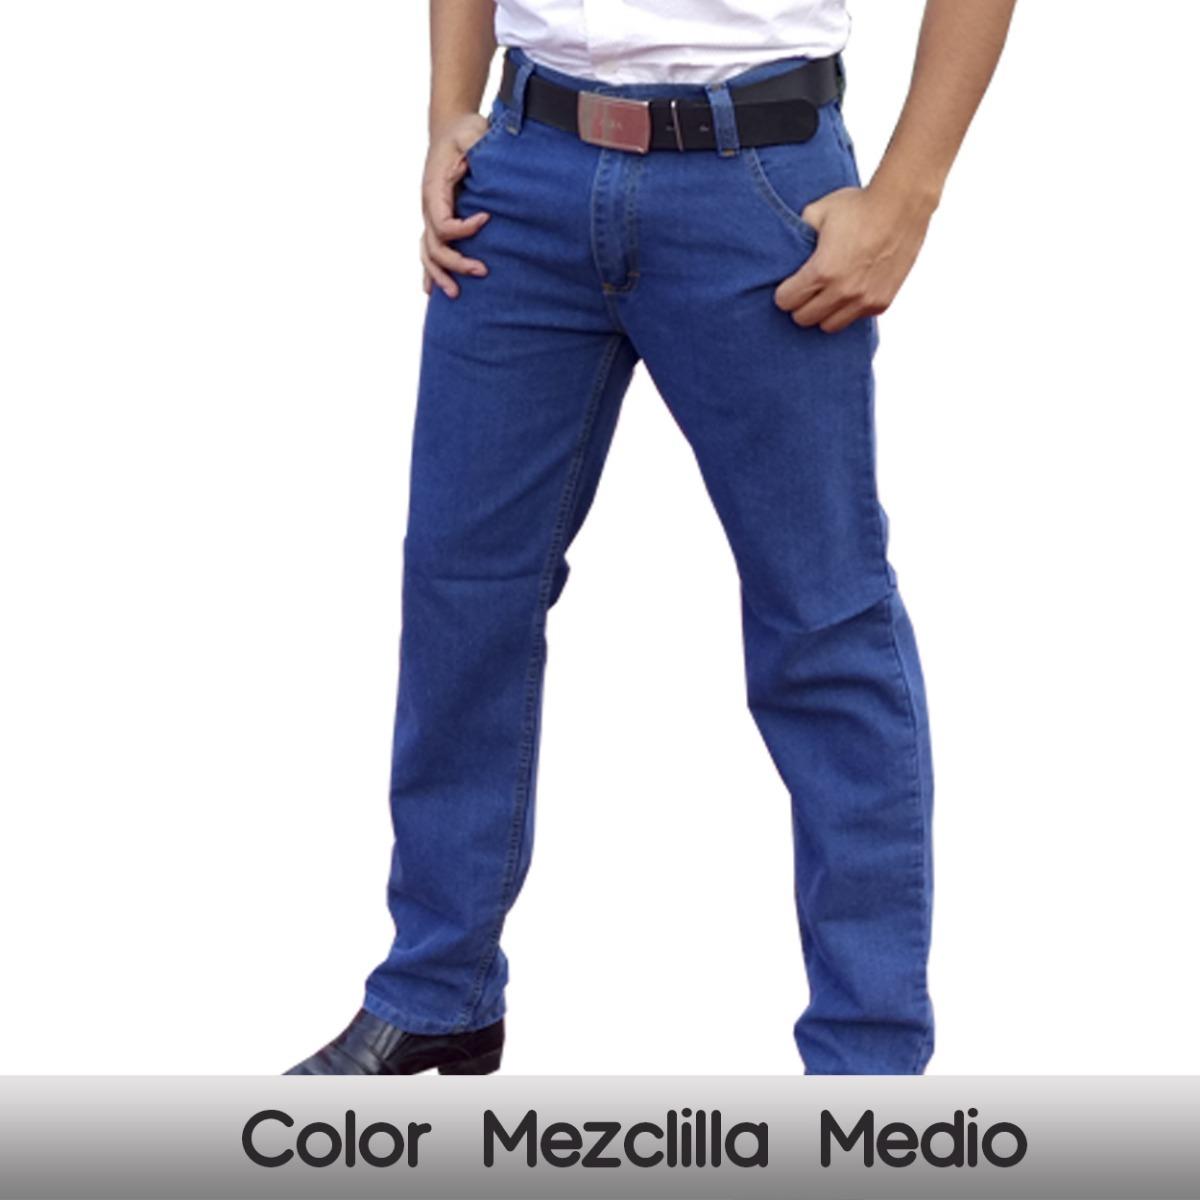 Caballero Vaquero Baratos Pantalones Corte Hombre 534LqjAR